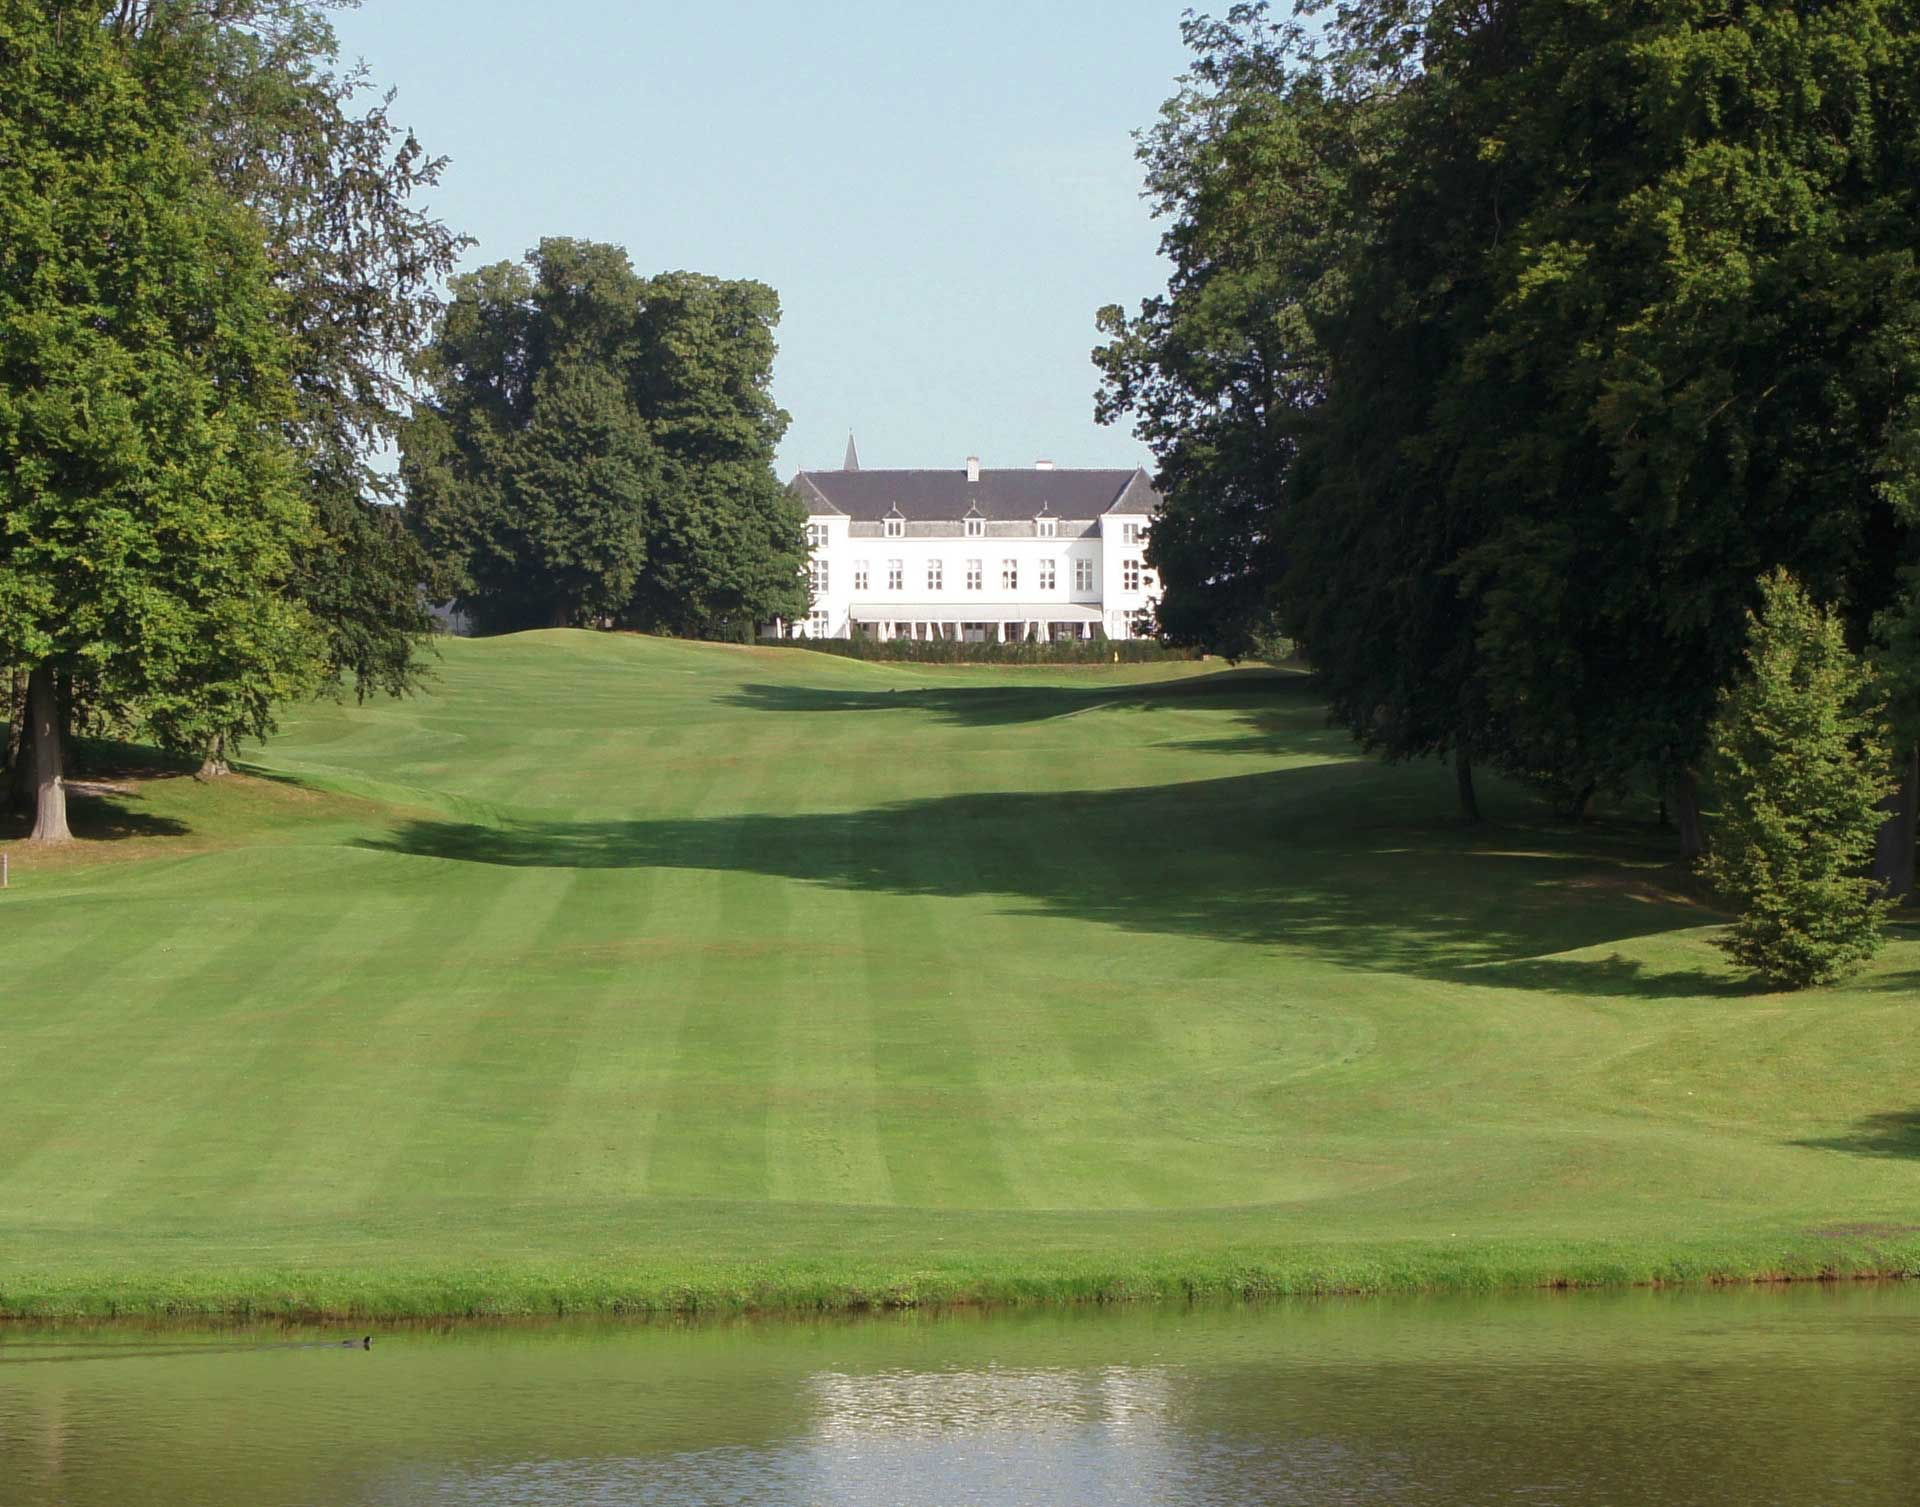 Golf-reizen-Golf-Expedition-België-Regio-Brussel-Martins-Chateau-du-Lac-golf-course-2